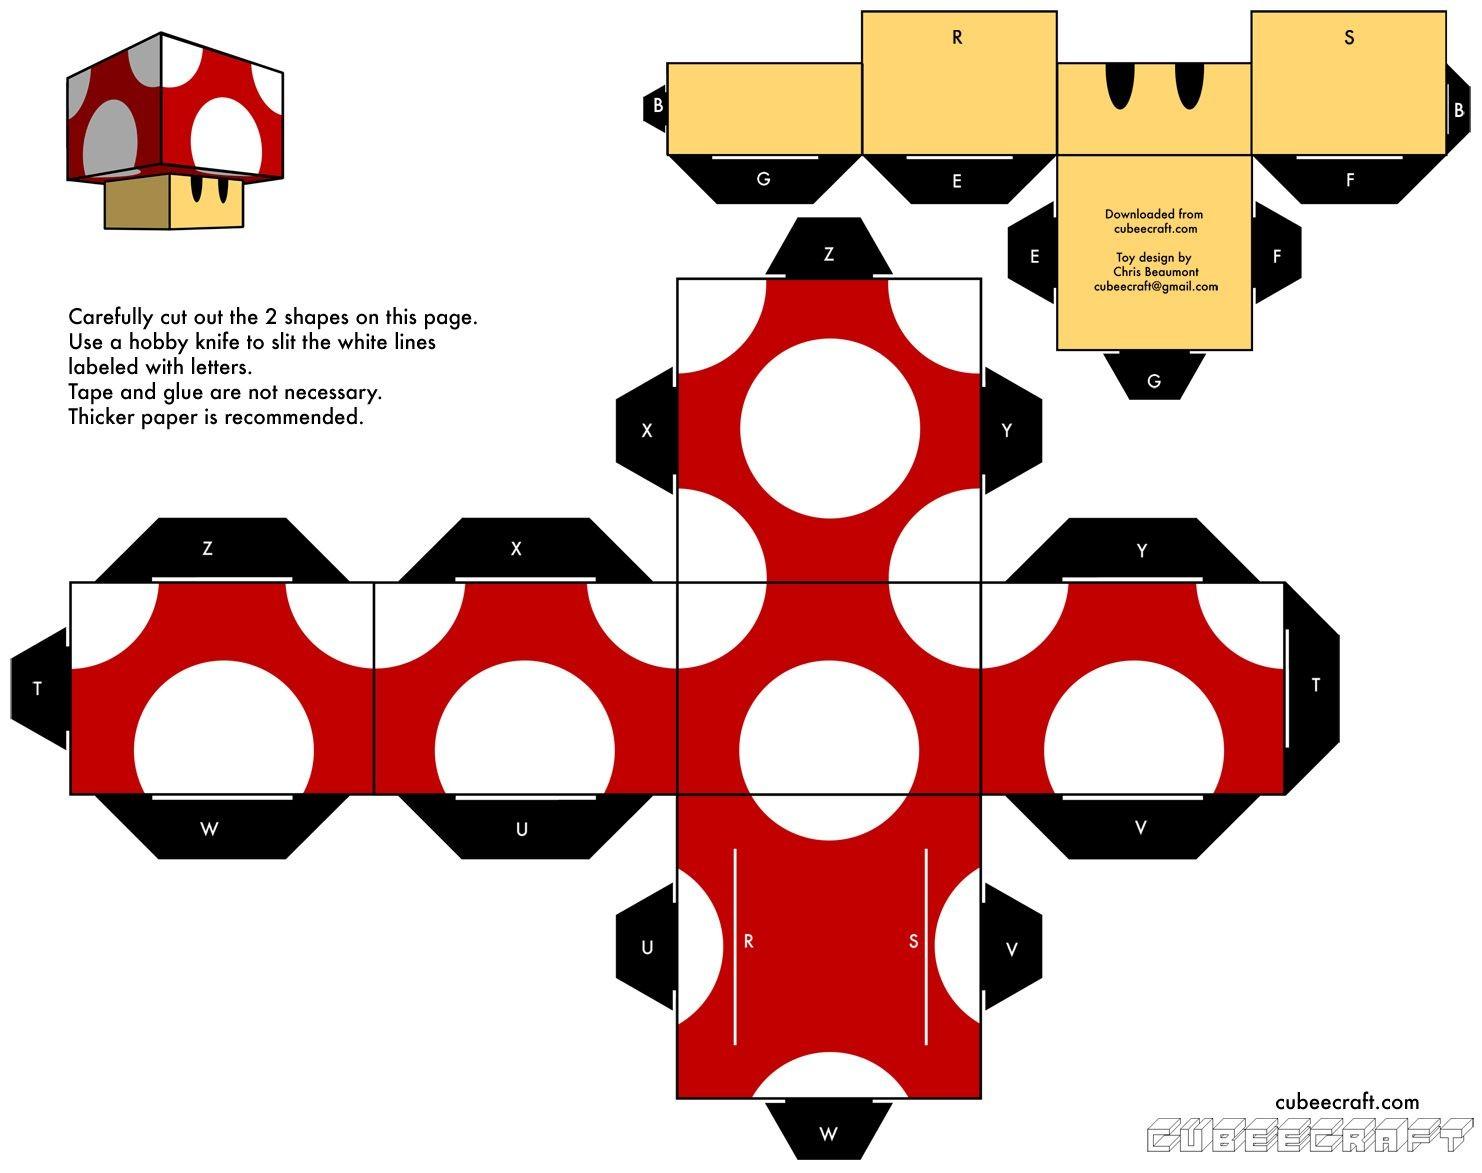 Companion Cube Papercraft Papercraft Mario Angry Birds Matt Groening[para Imprimir]